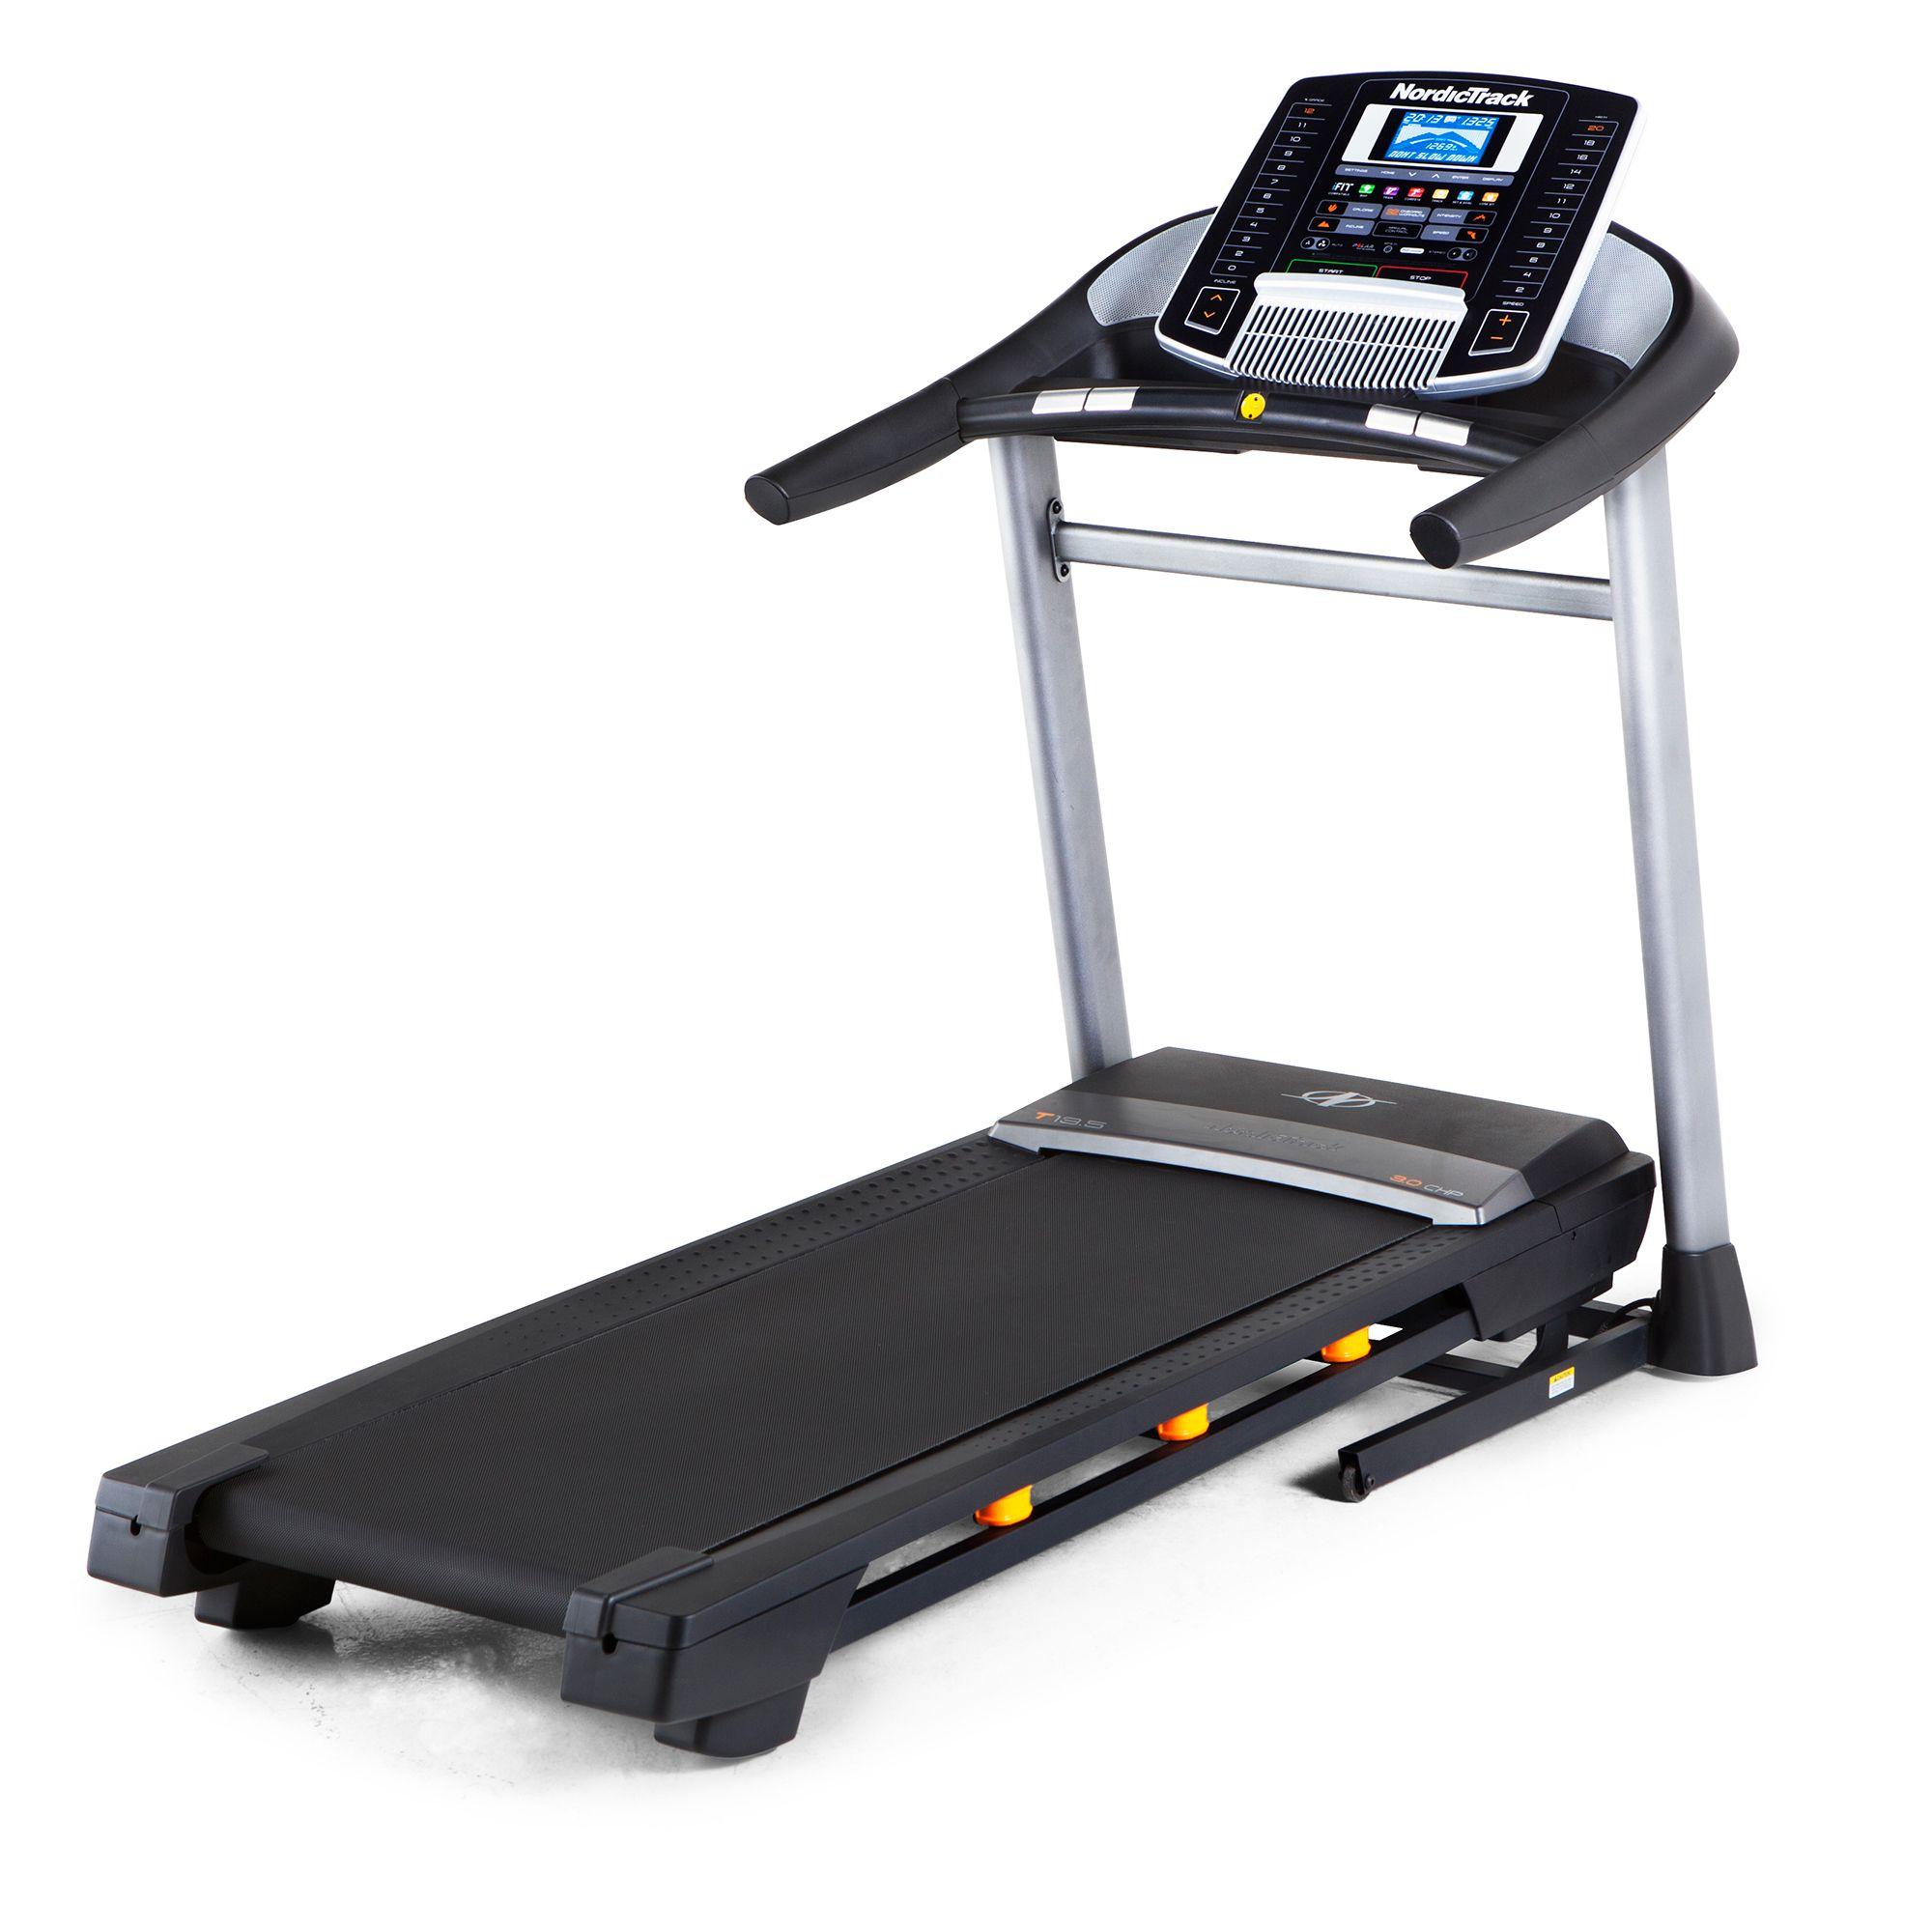 Sole Treadmill Order Tracking: NordicTrack T13.5 Treadmill